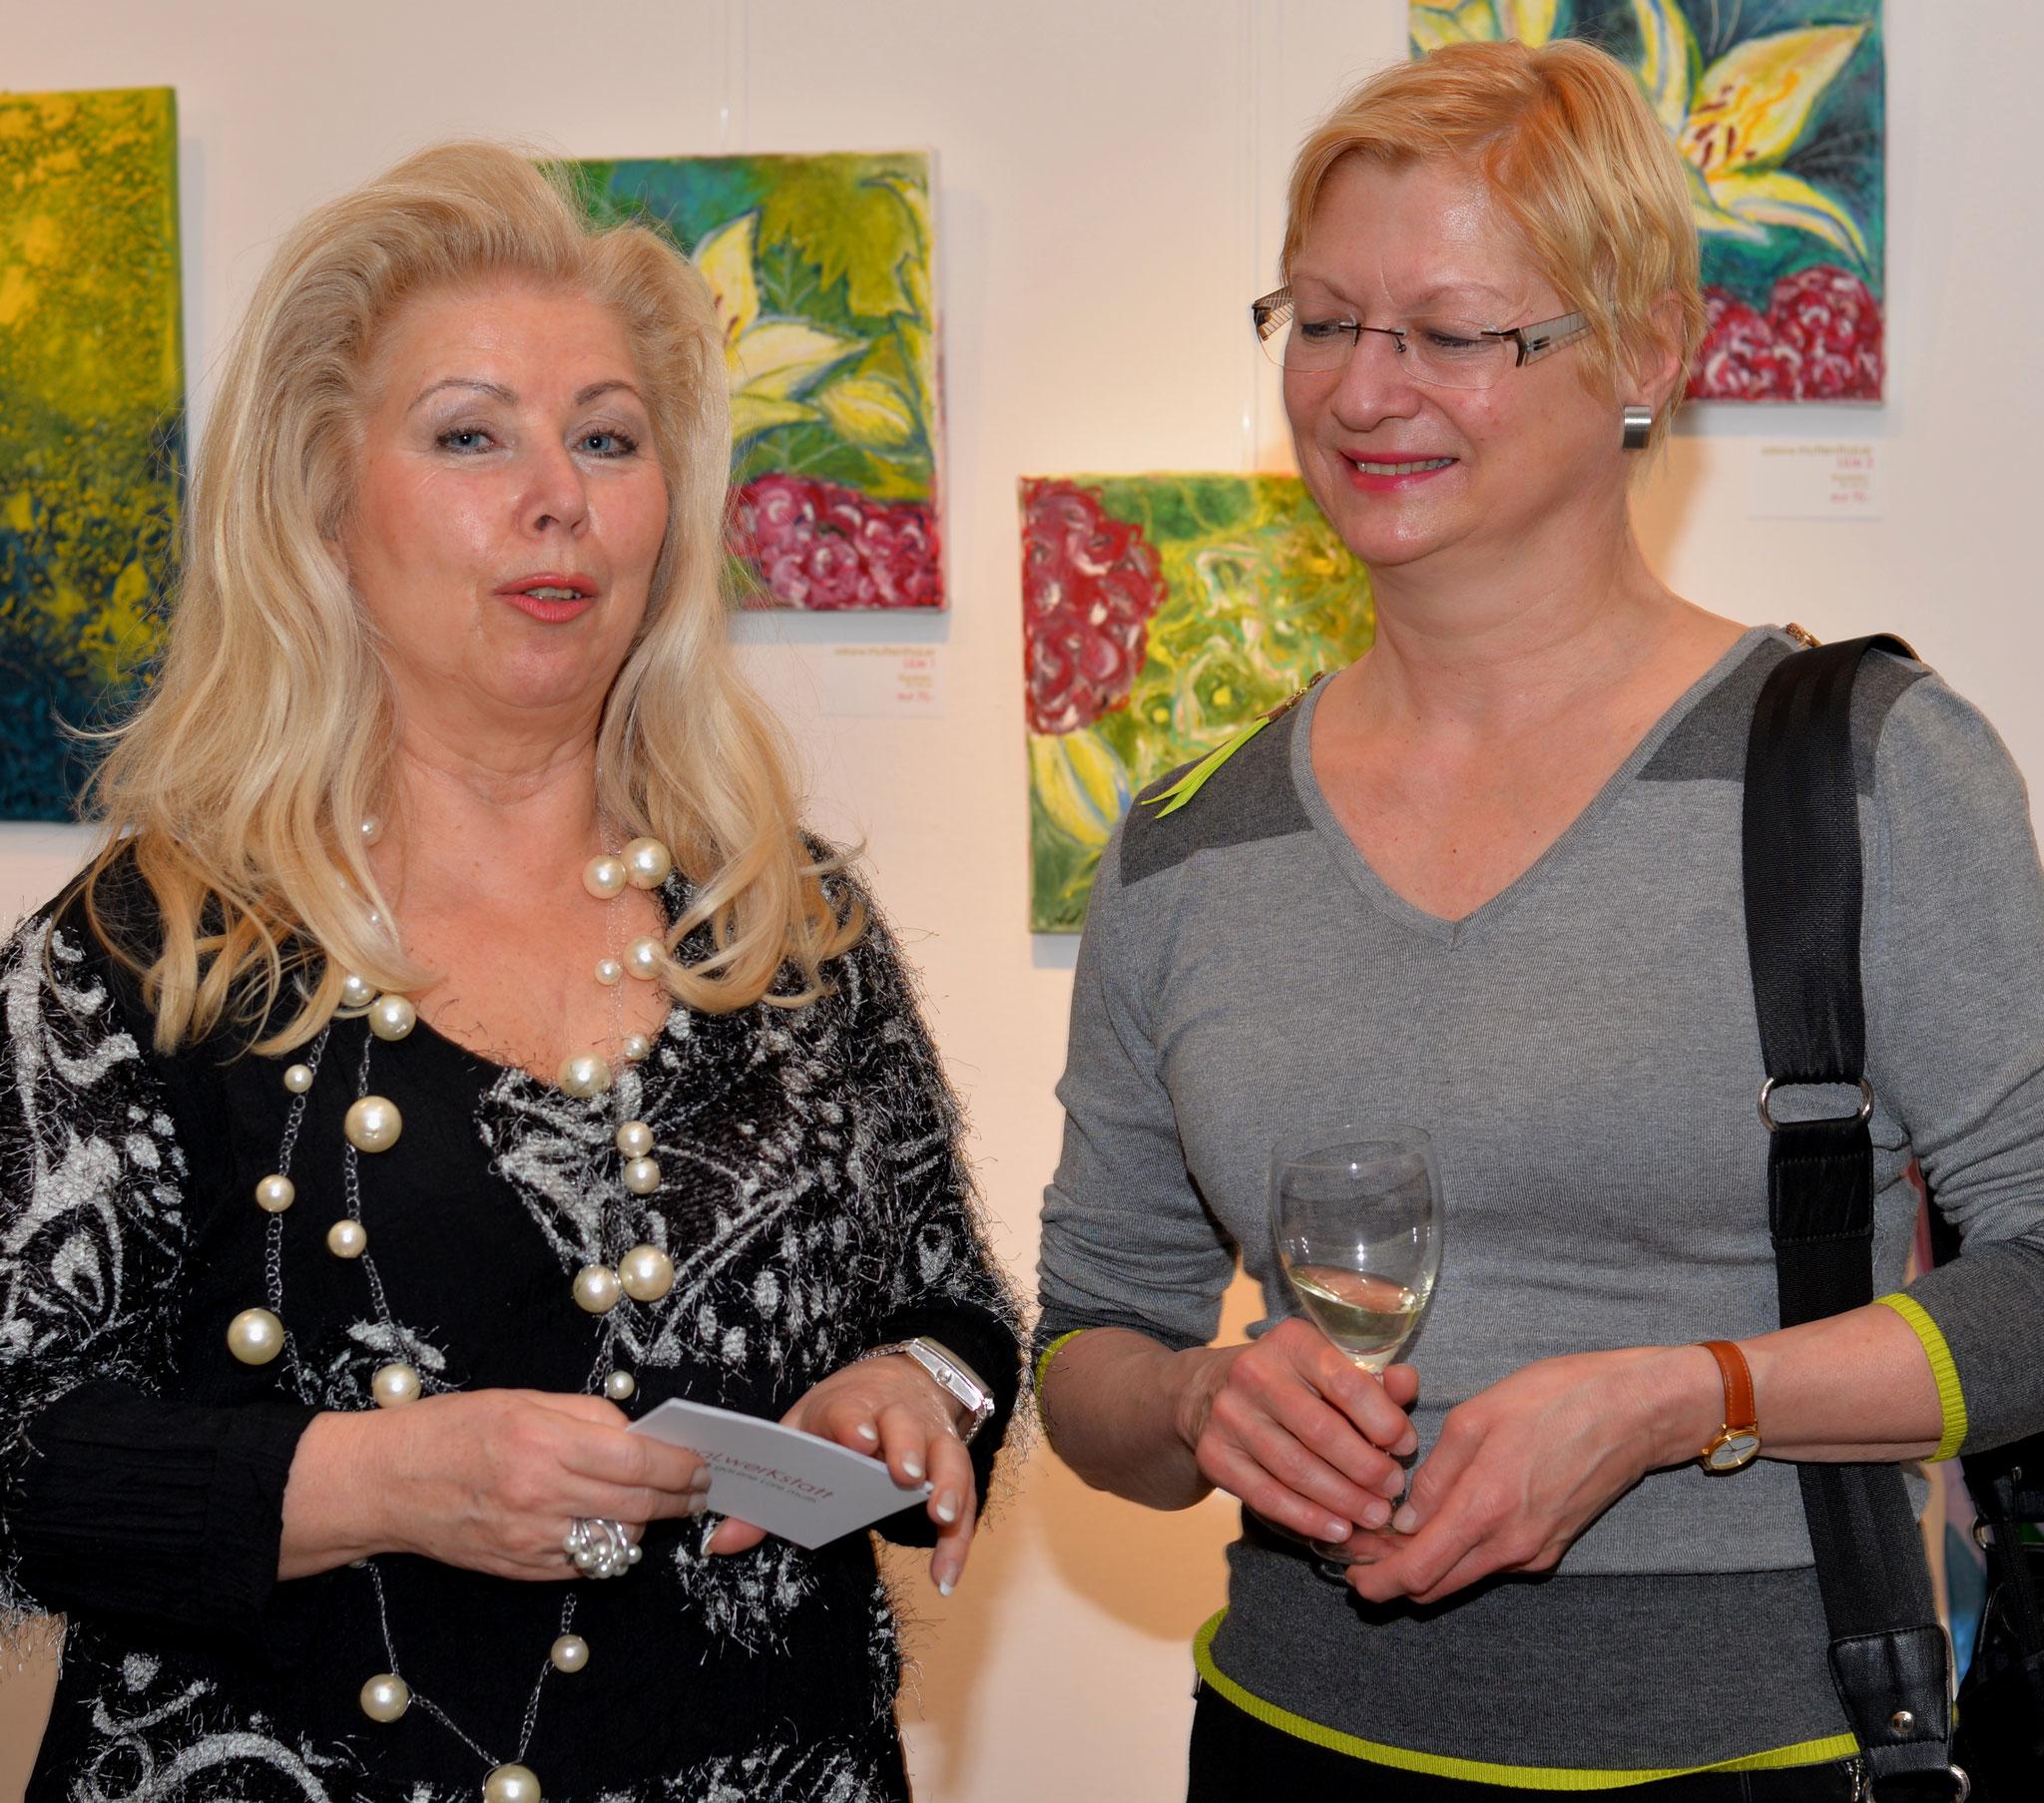 Lore Muth & Adriane Muttenthaler